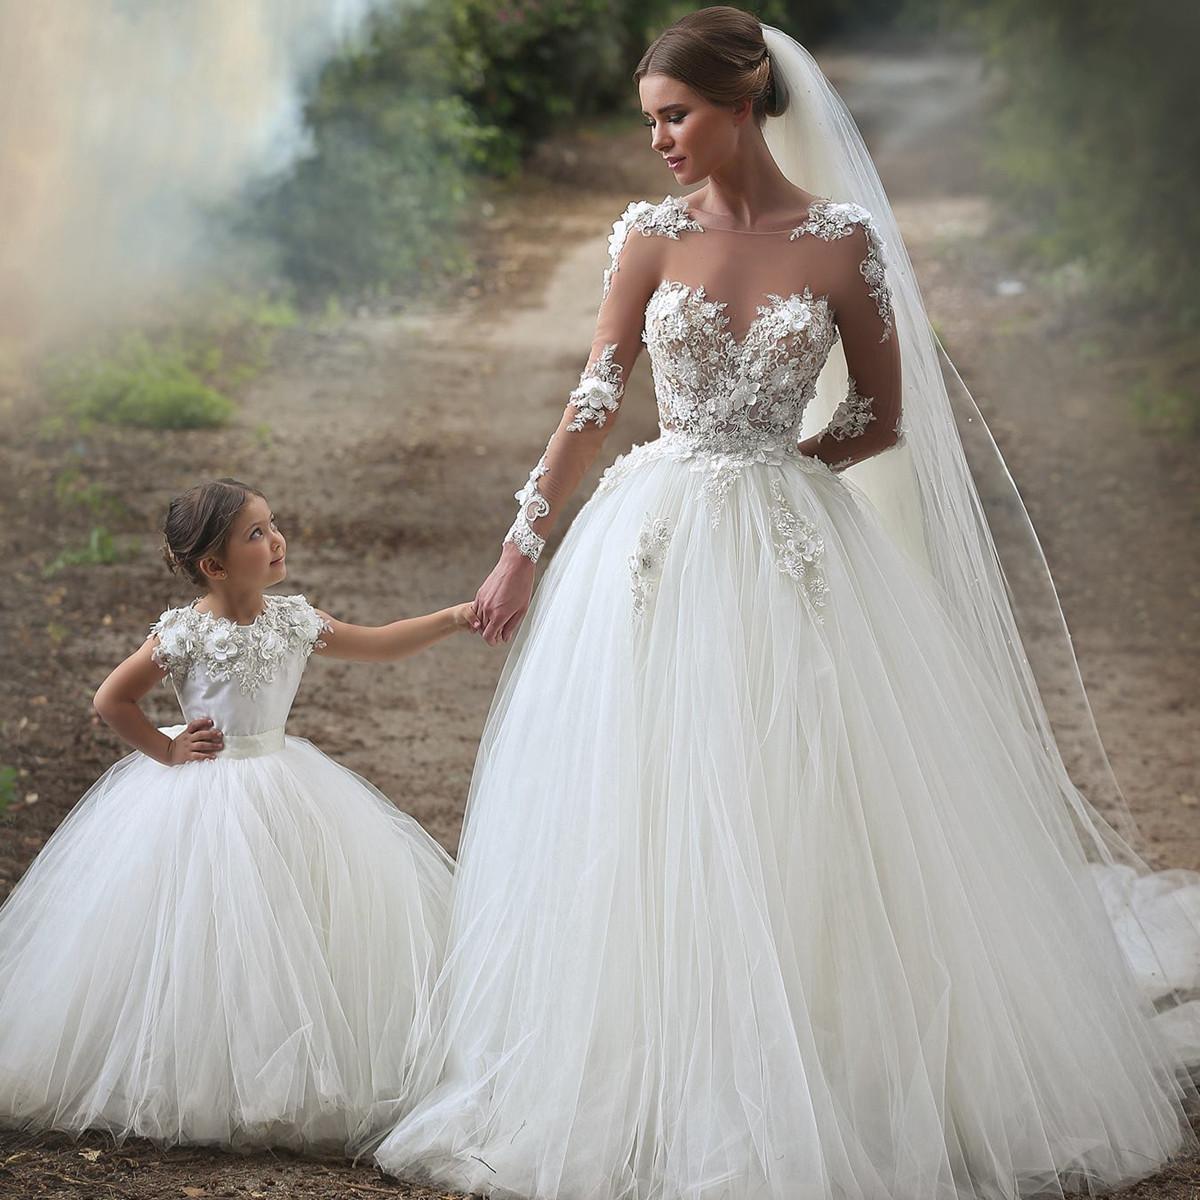 Princess Wedding Dresses sheer long sleeves tulle princess wedding dresses 2017 romantic bridal gowns ARZOQTQ